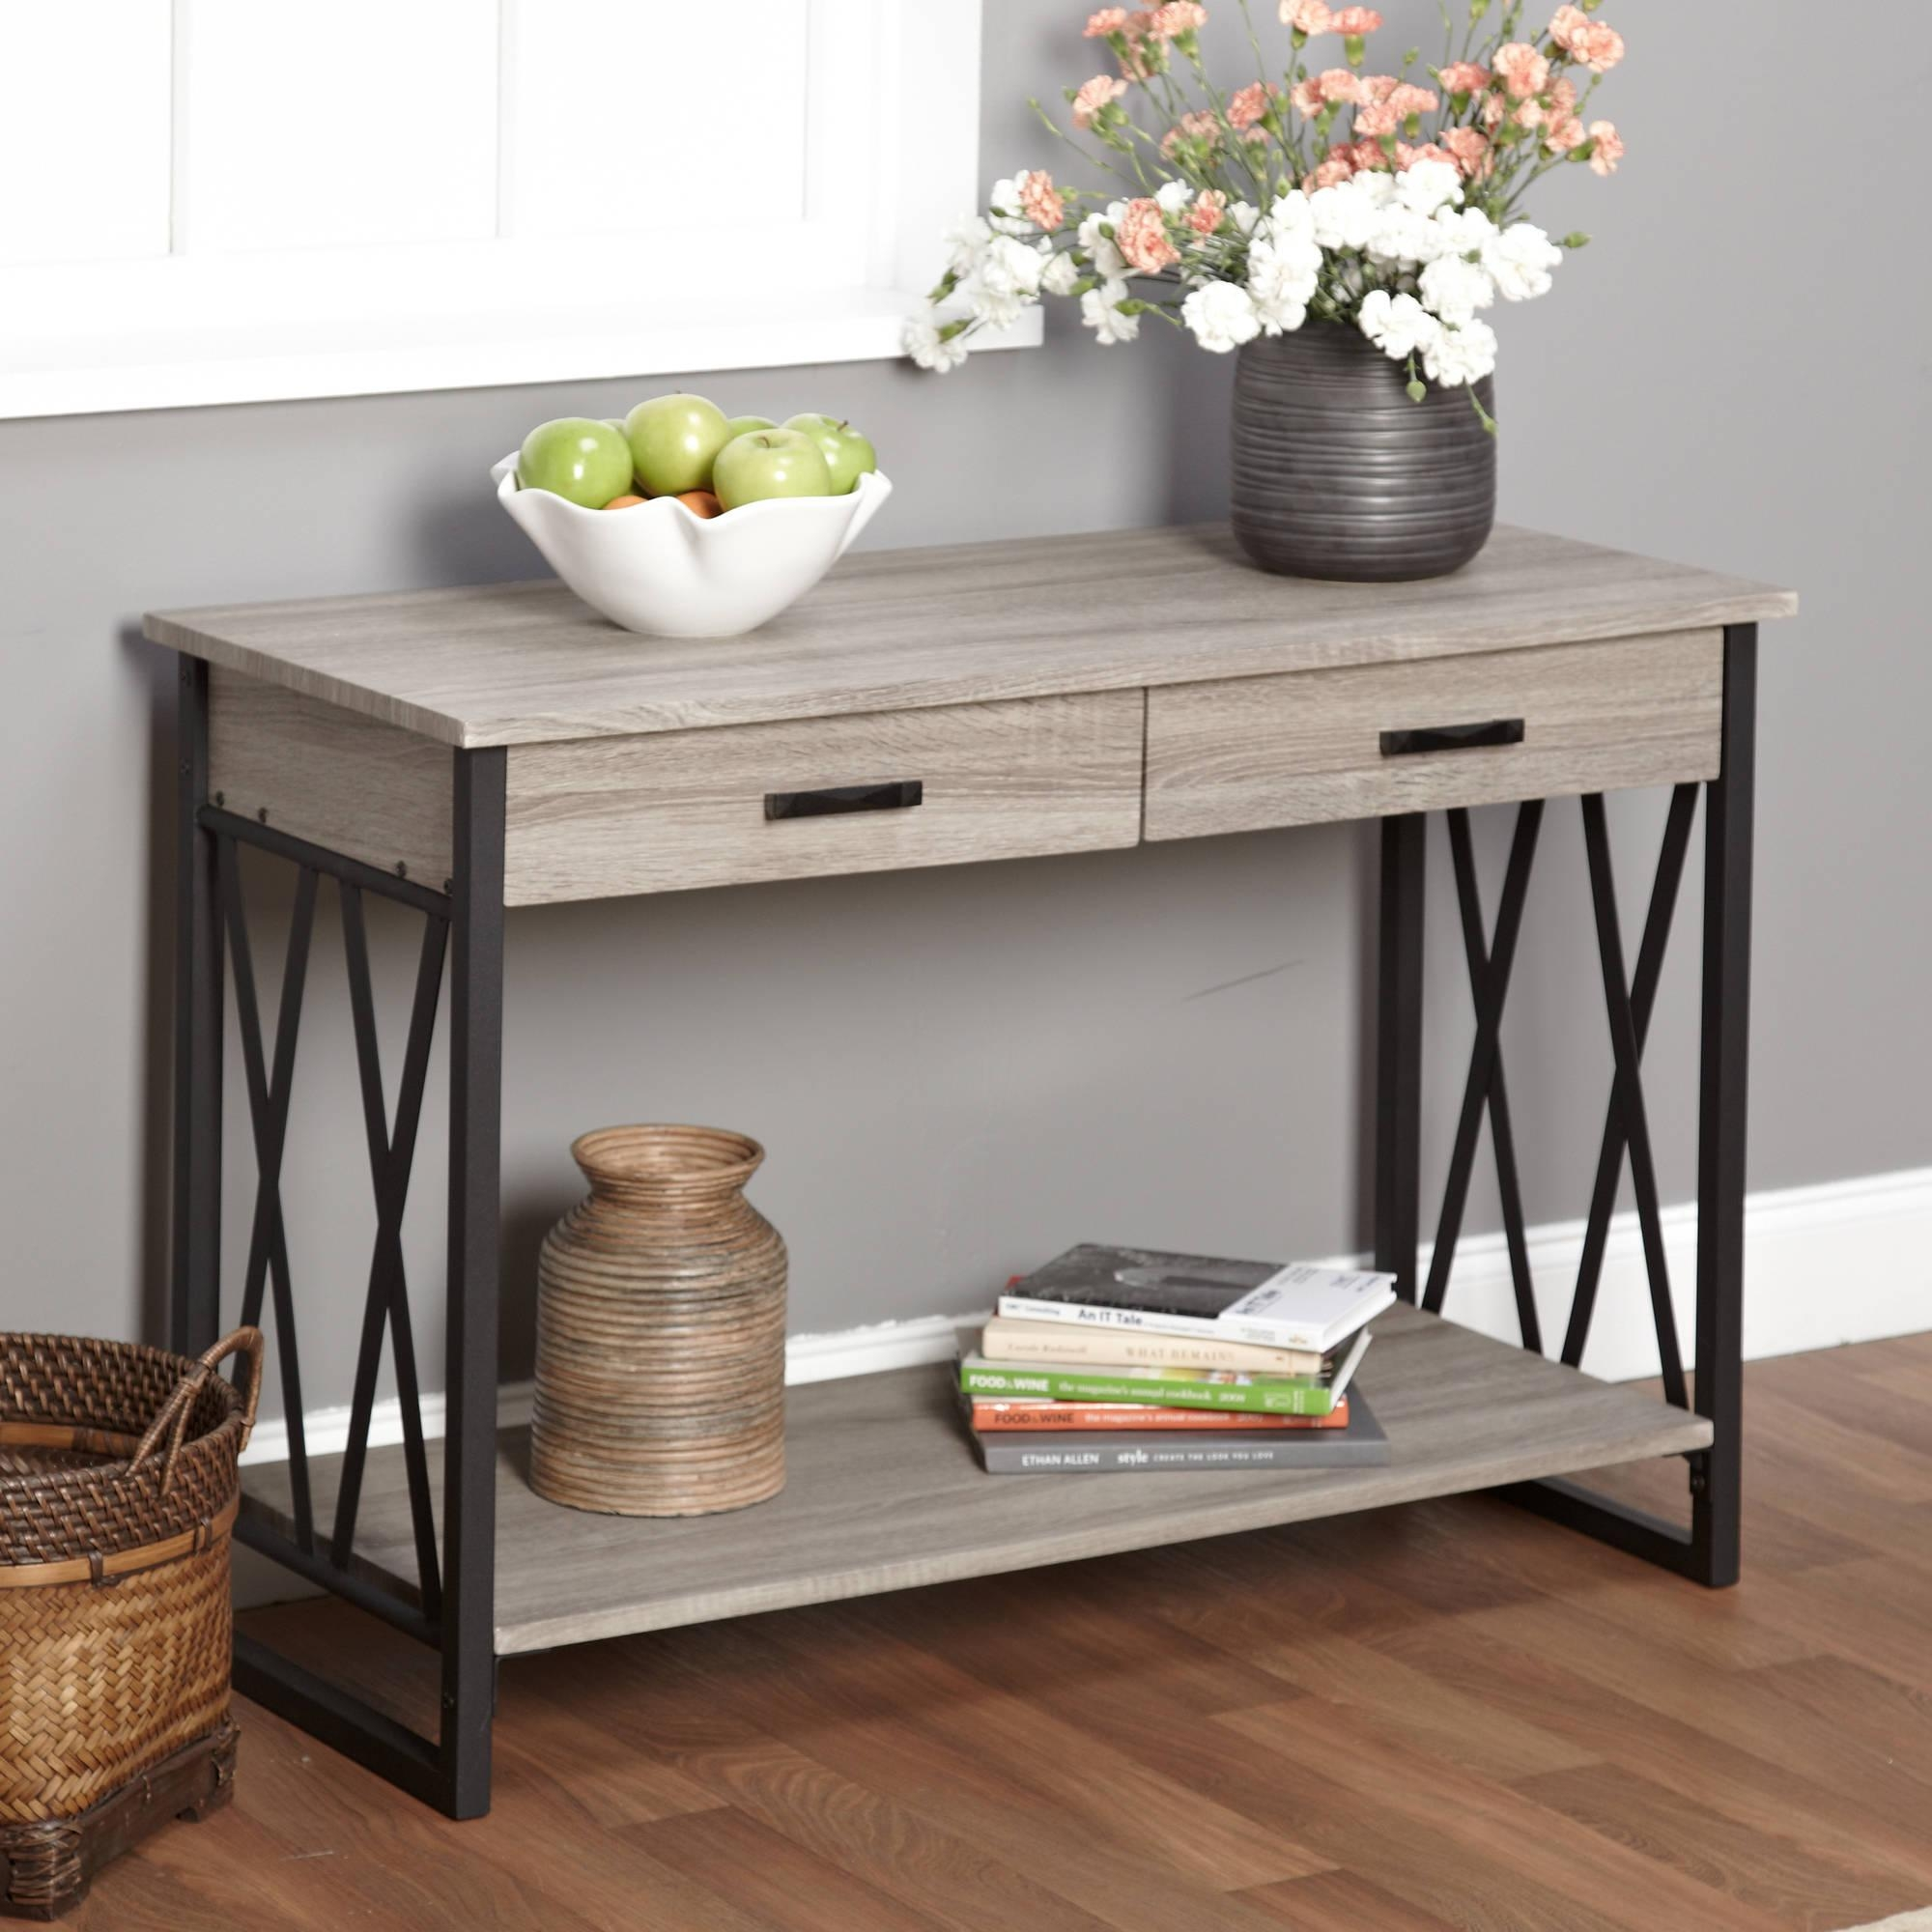 Sofas Center : Astounding Gray Sofa Table Image Inspirations Slate Within Slate Sofa Tables (Image 19 of 20)